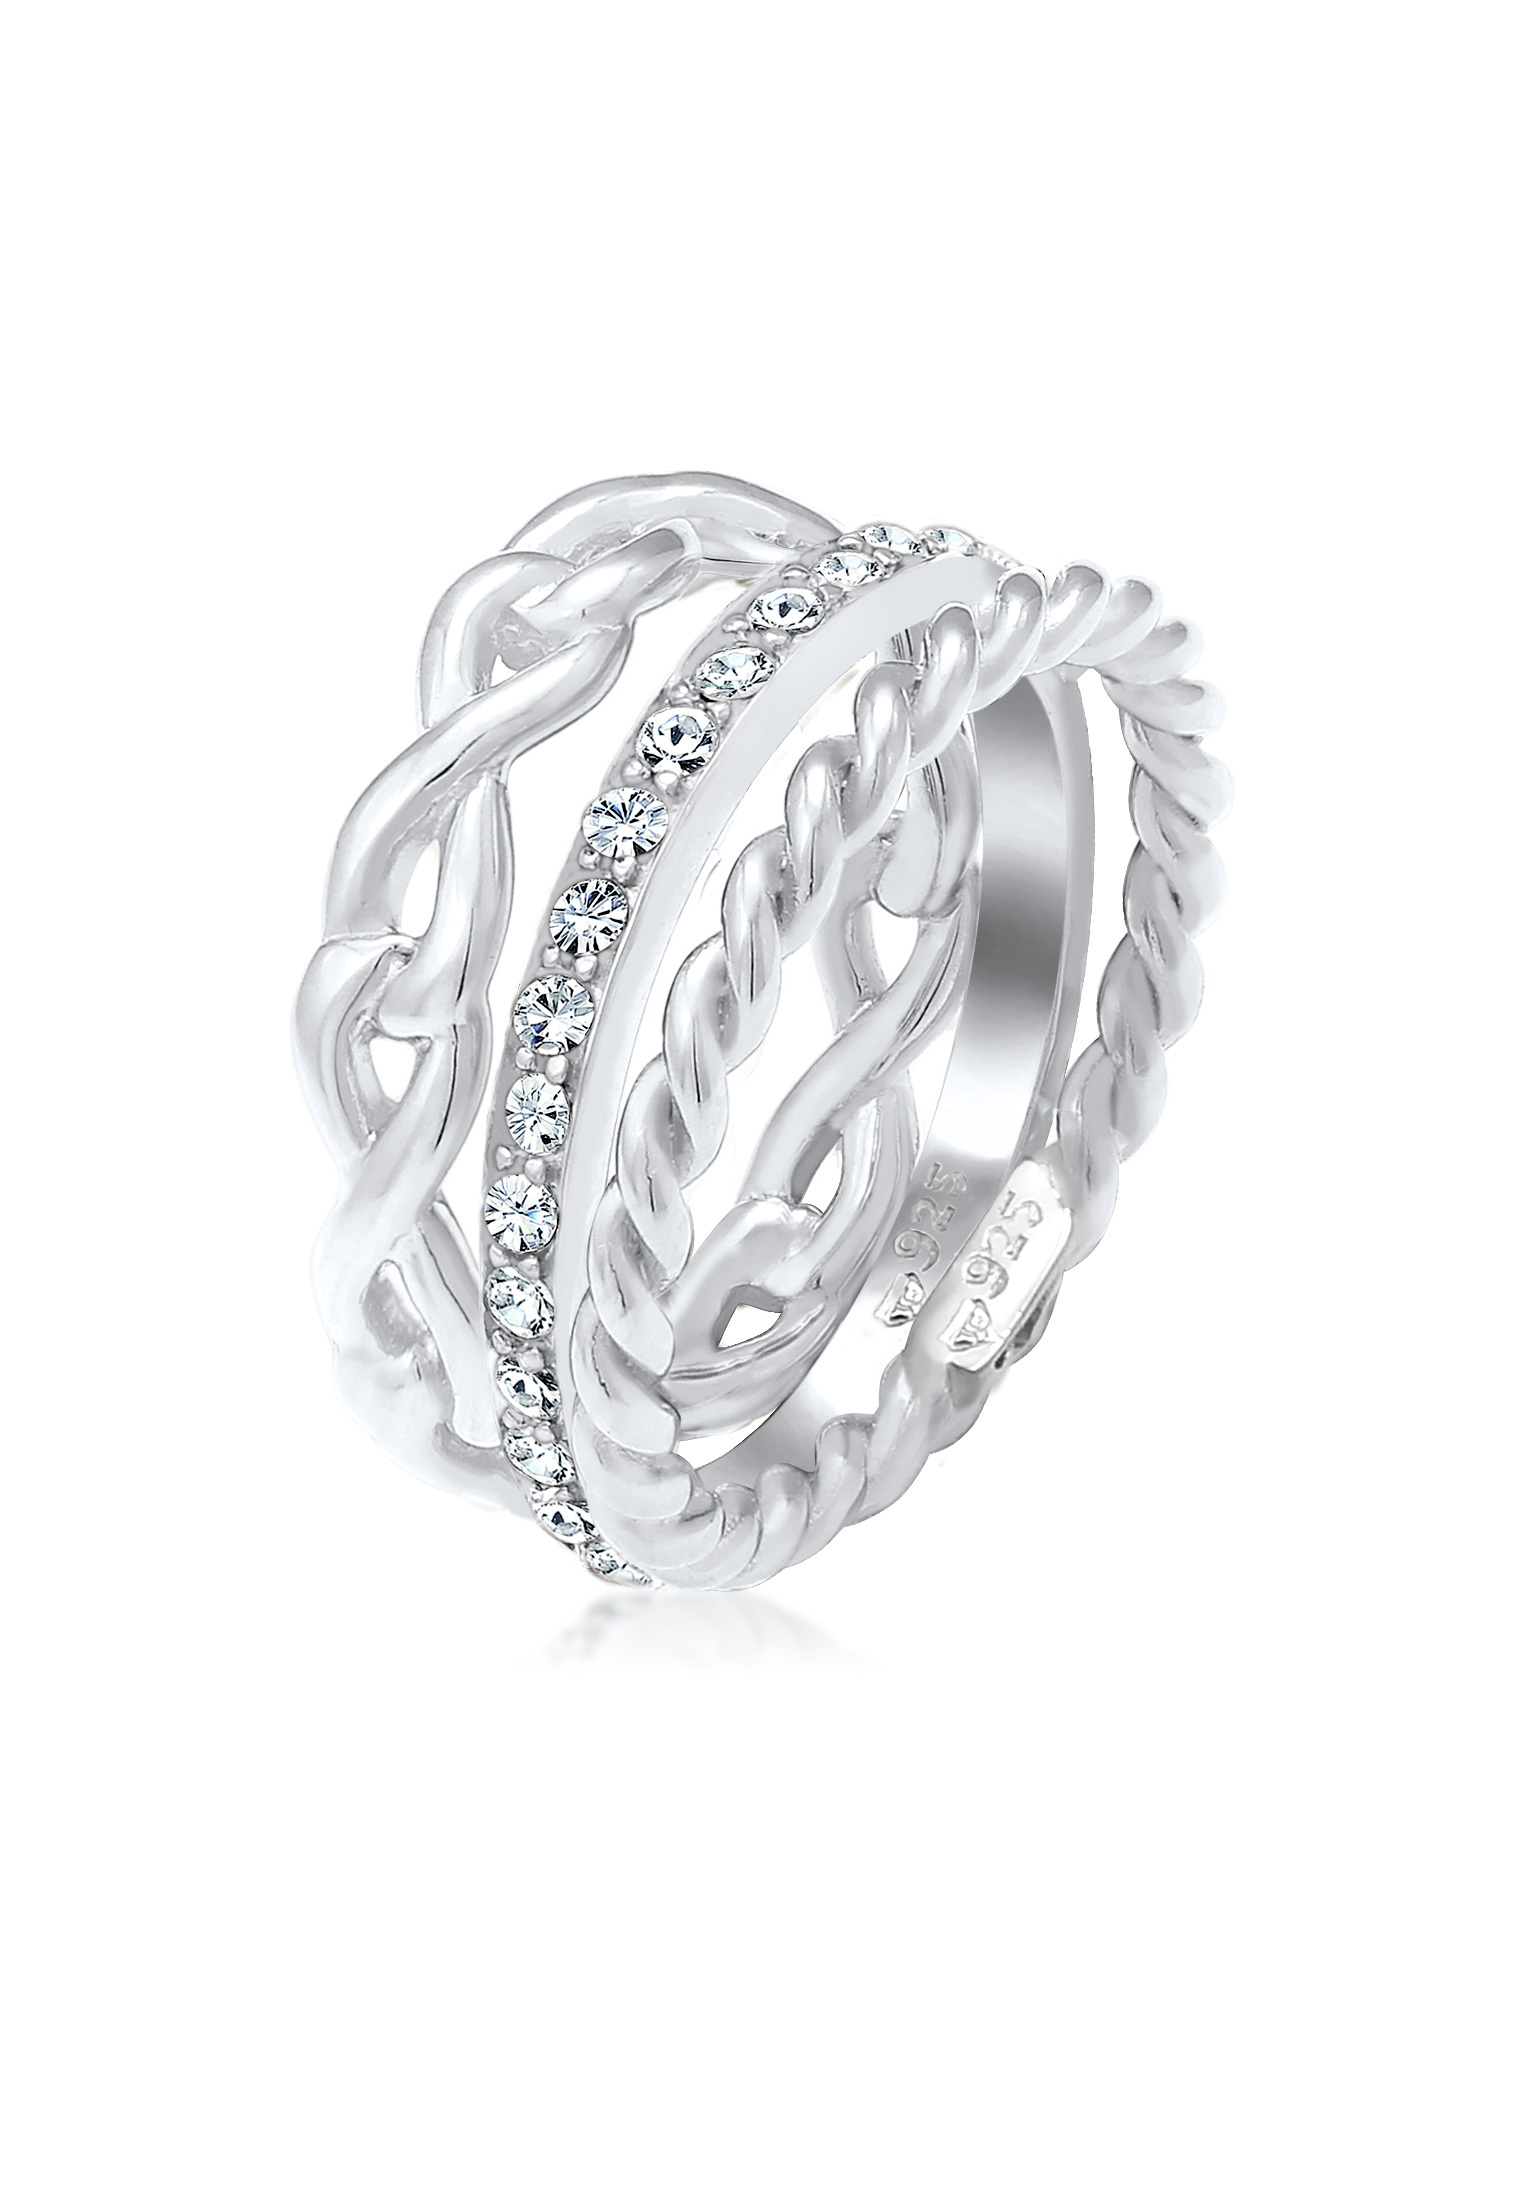 Ringset Infinity | Kristall ( Weiß ) | 925er Sterling Silber